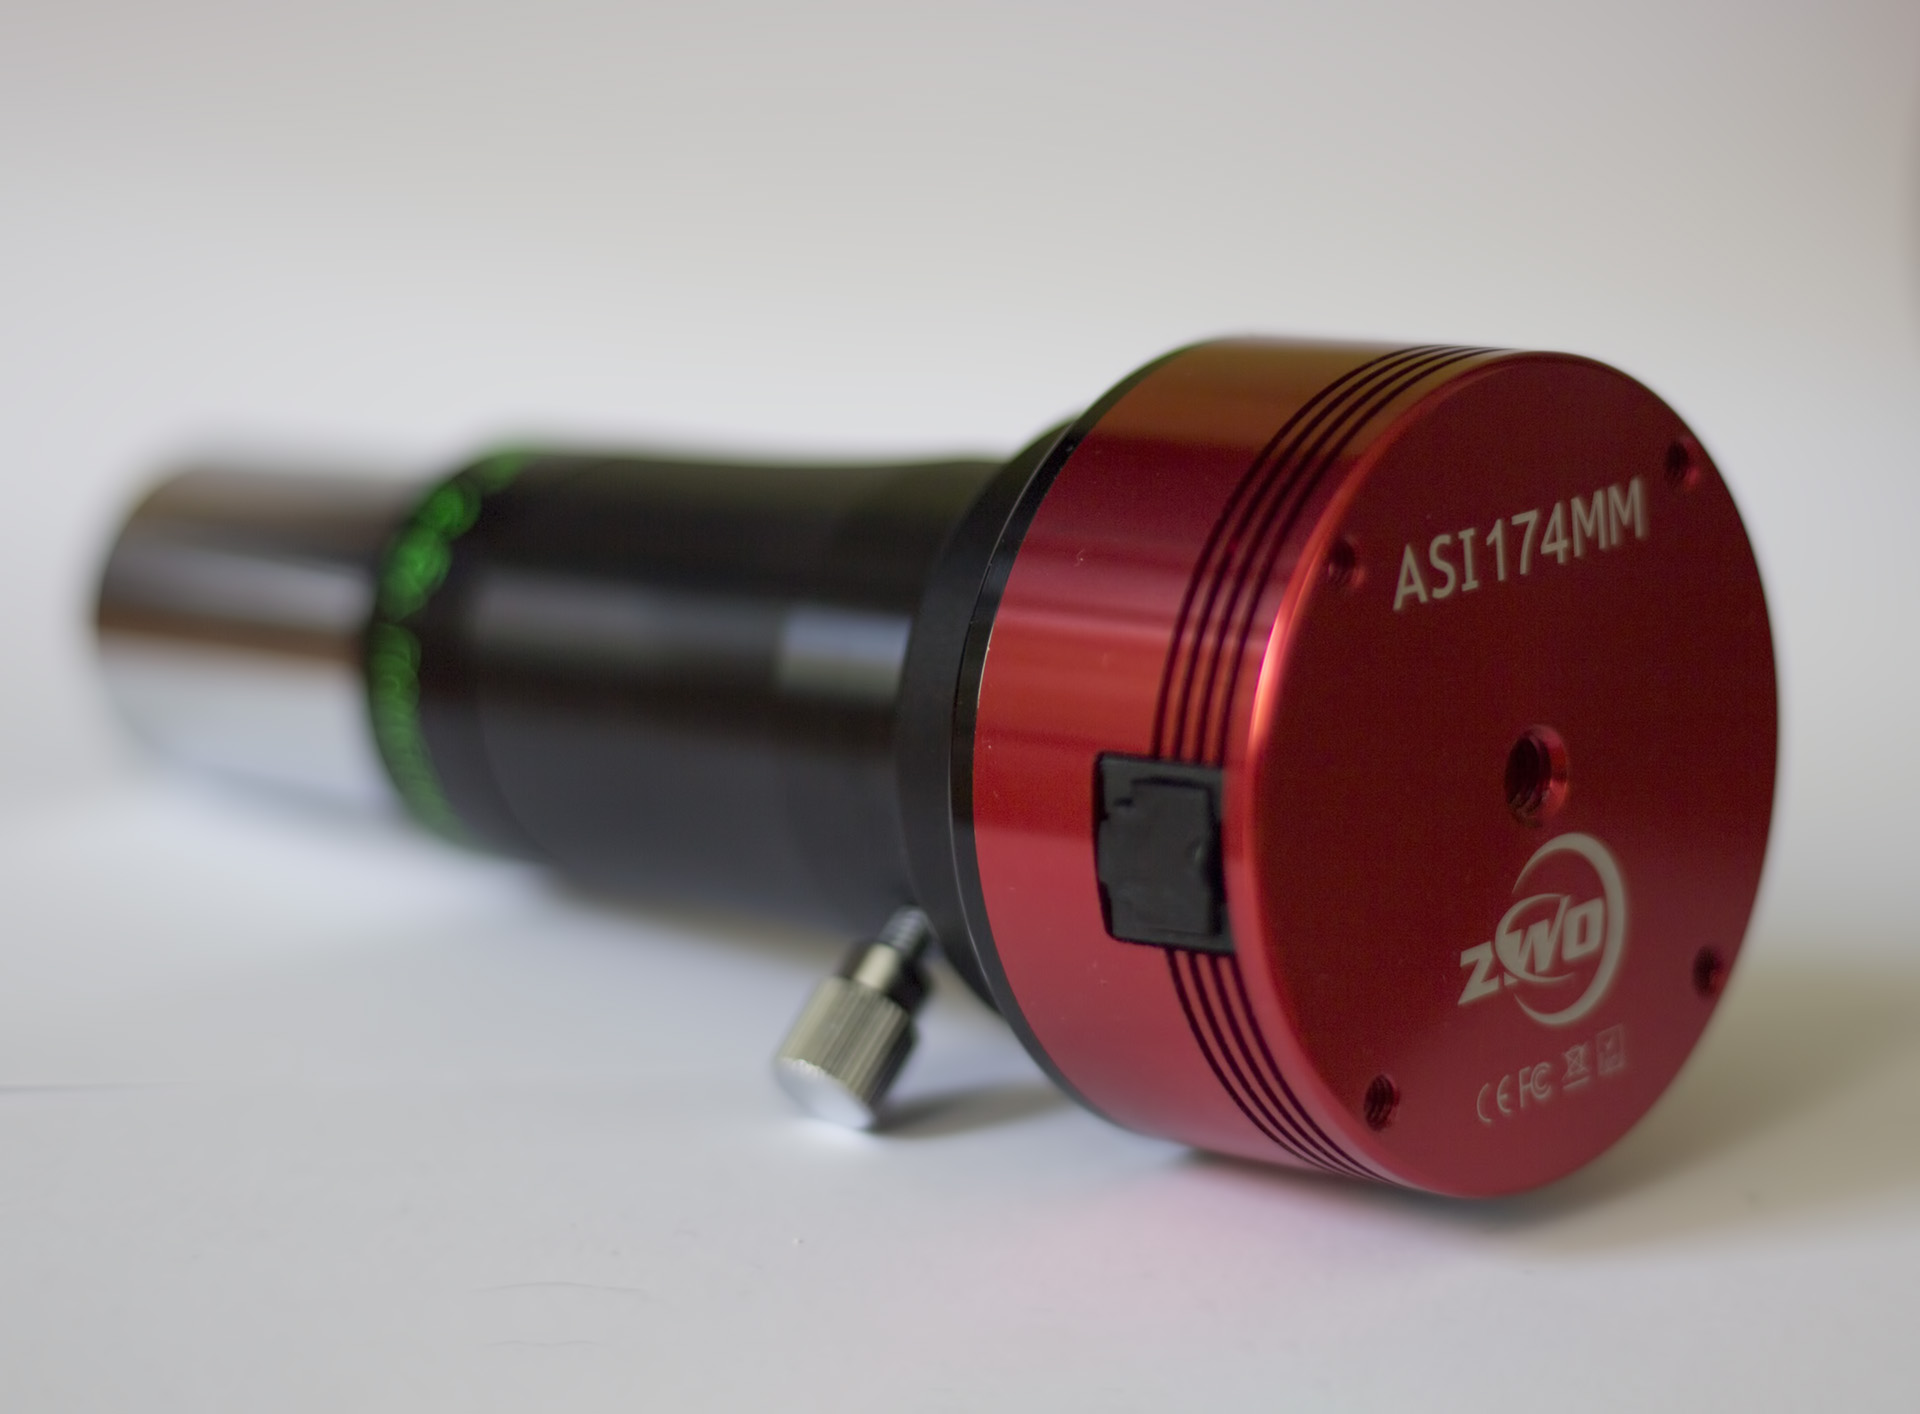 ZWO ASI174mm astro CMOS